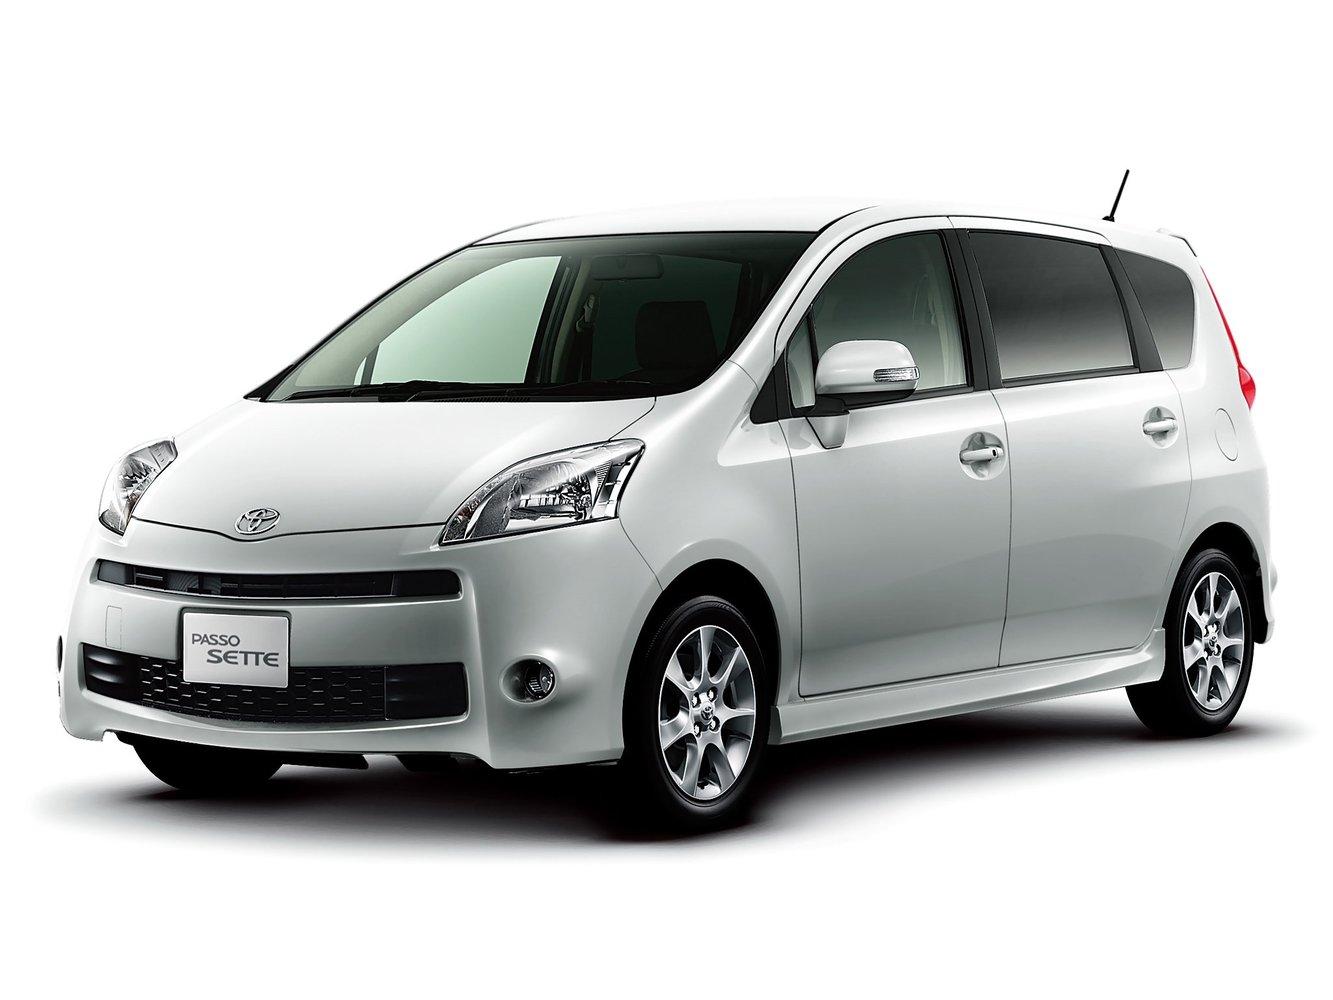 toyota Toyota Passo Sette